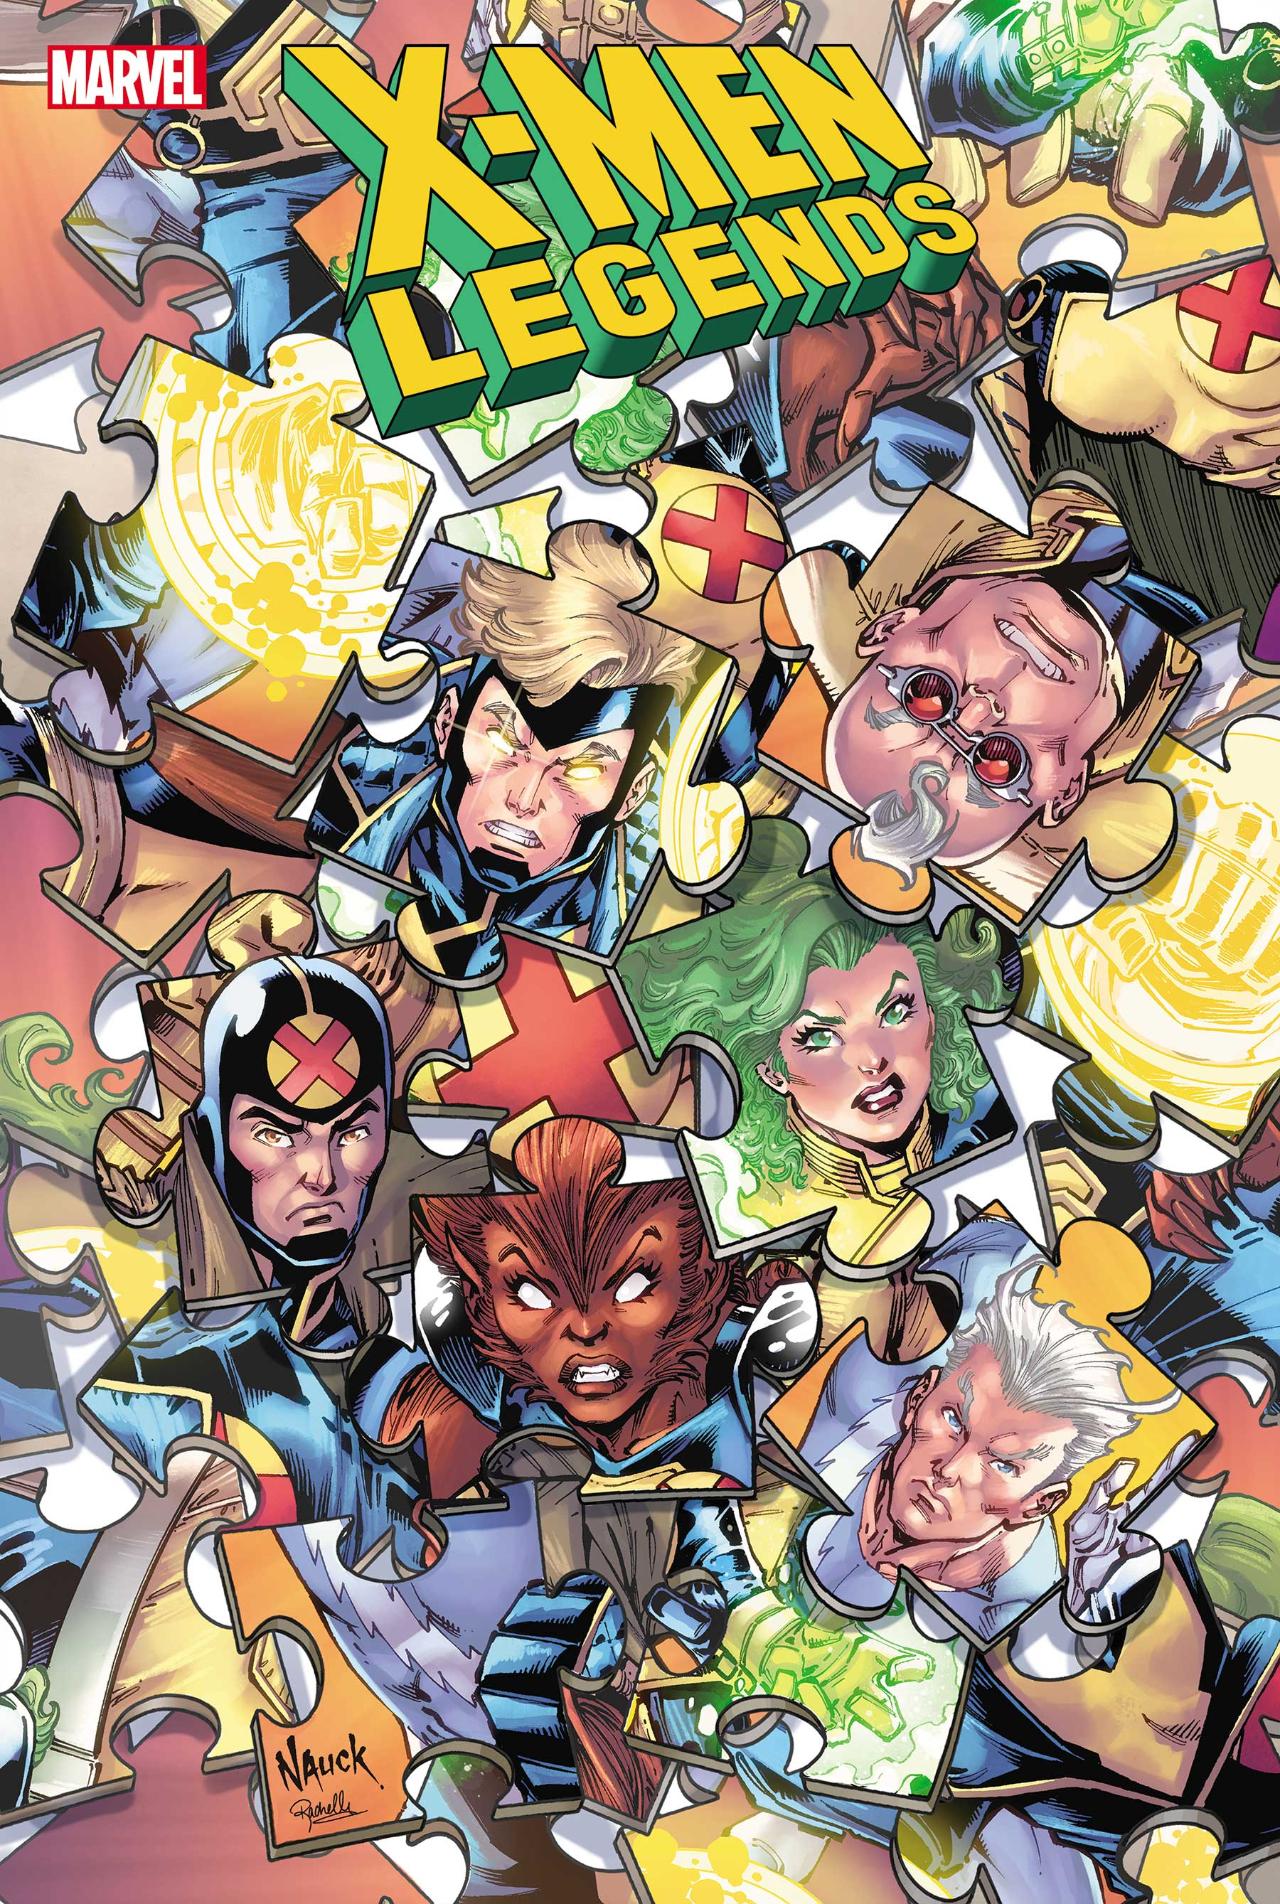 Leyendas de X-Men # 5